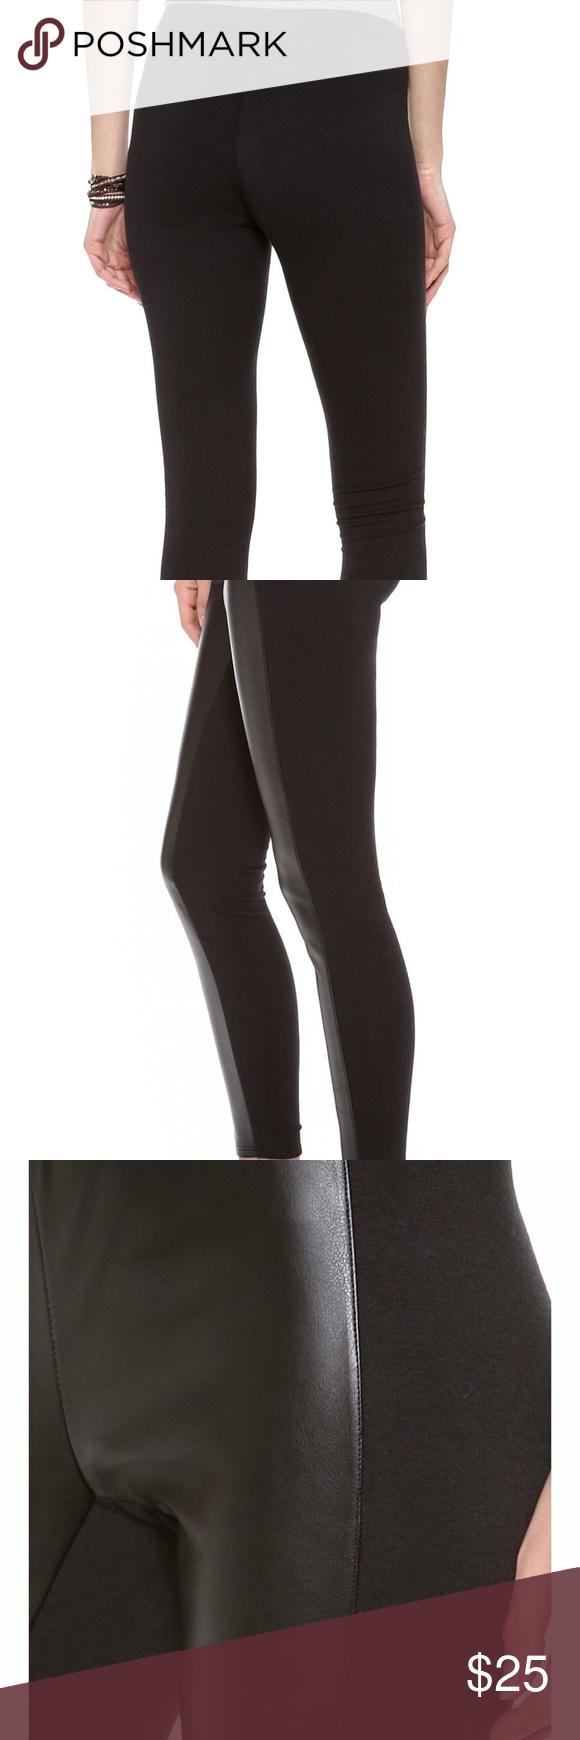 c3fa90cfbe7807 Splendid Women's Downtown Faux Leather Leggings XS Splendid Women's Downtown  Faux Leather Leggings Black X-